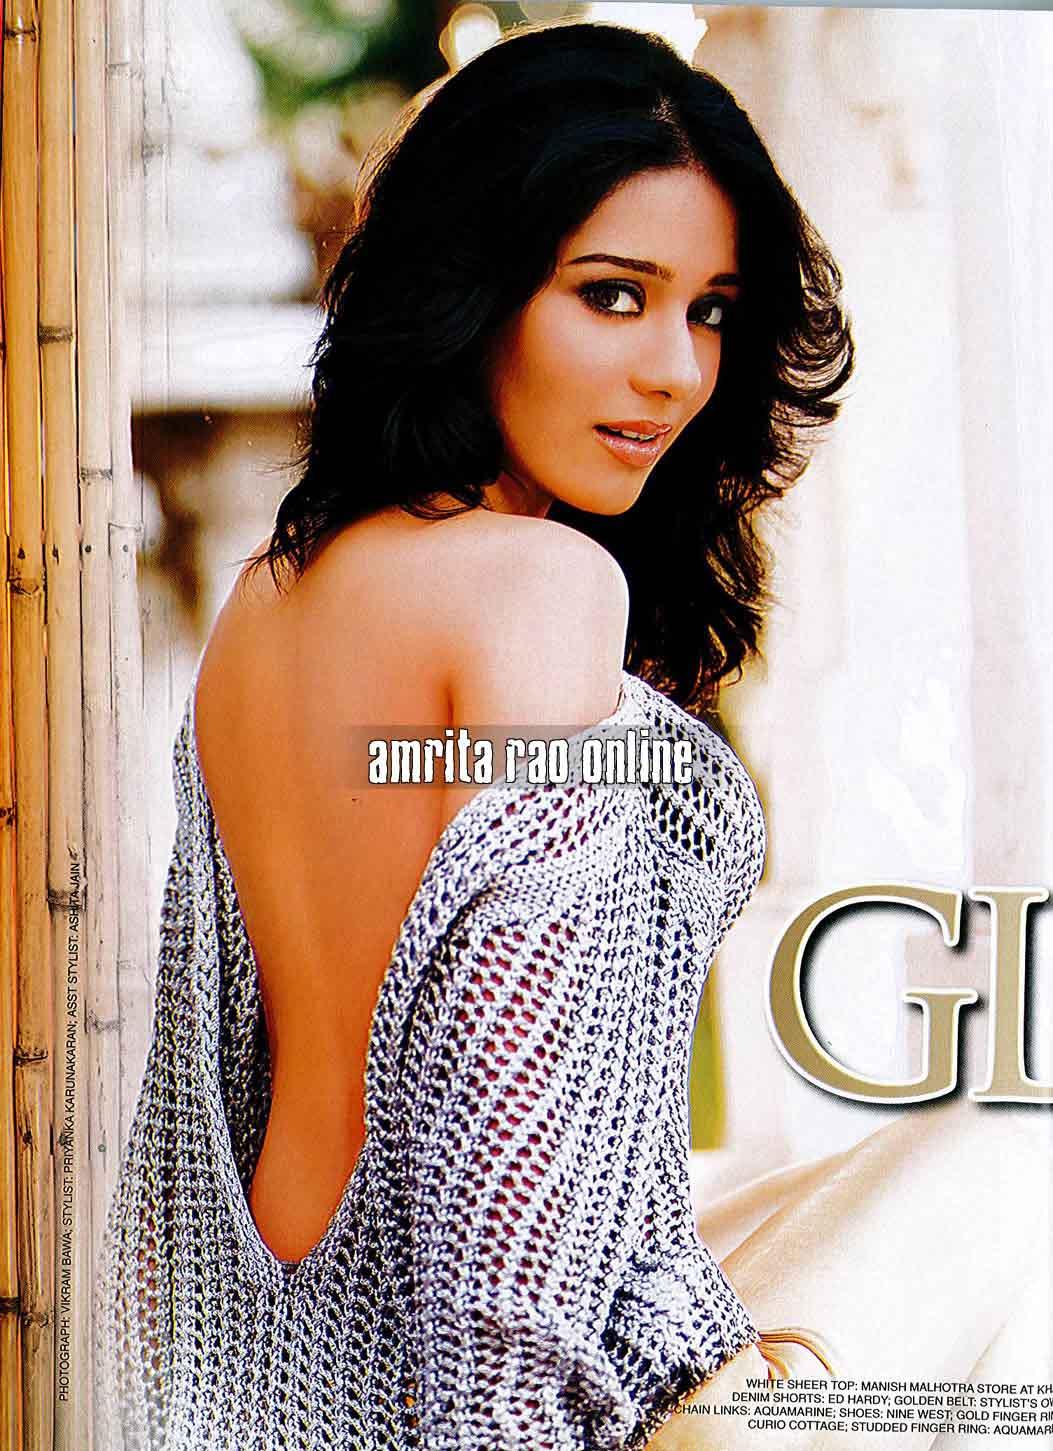 Amrita and Malaika Arora Hot Backless Pictures, Photos